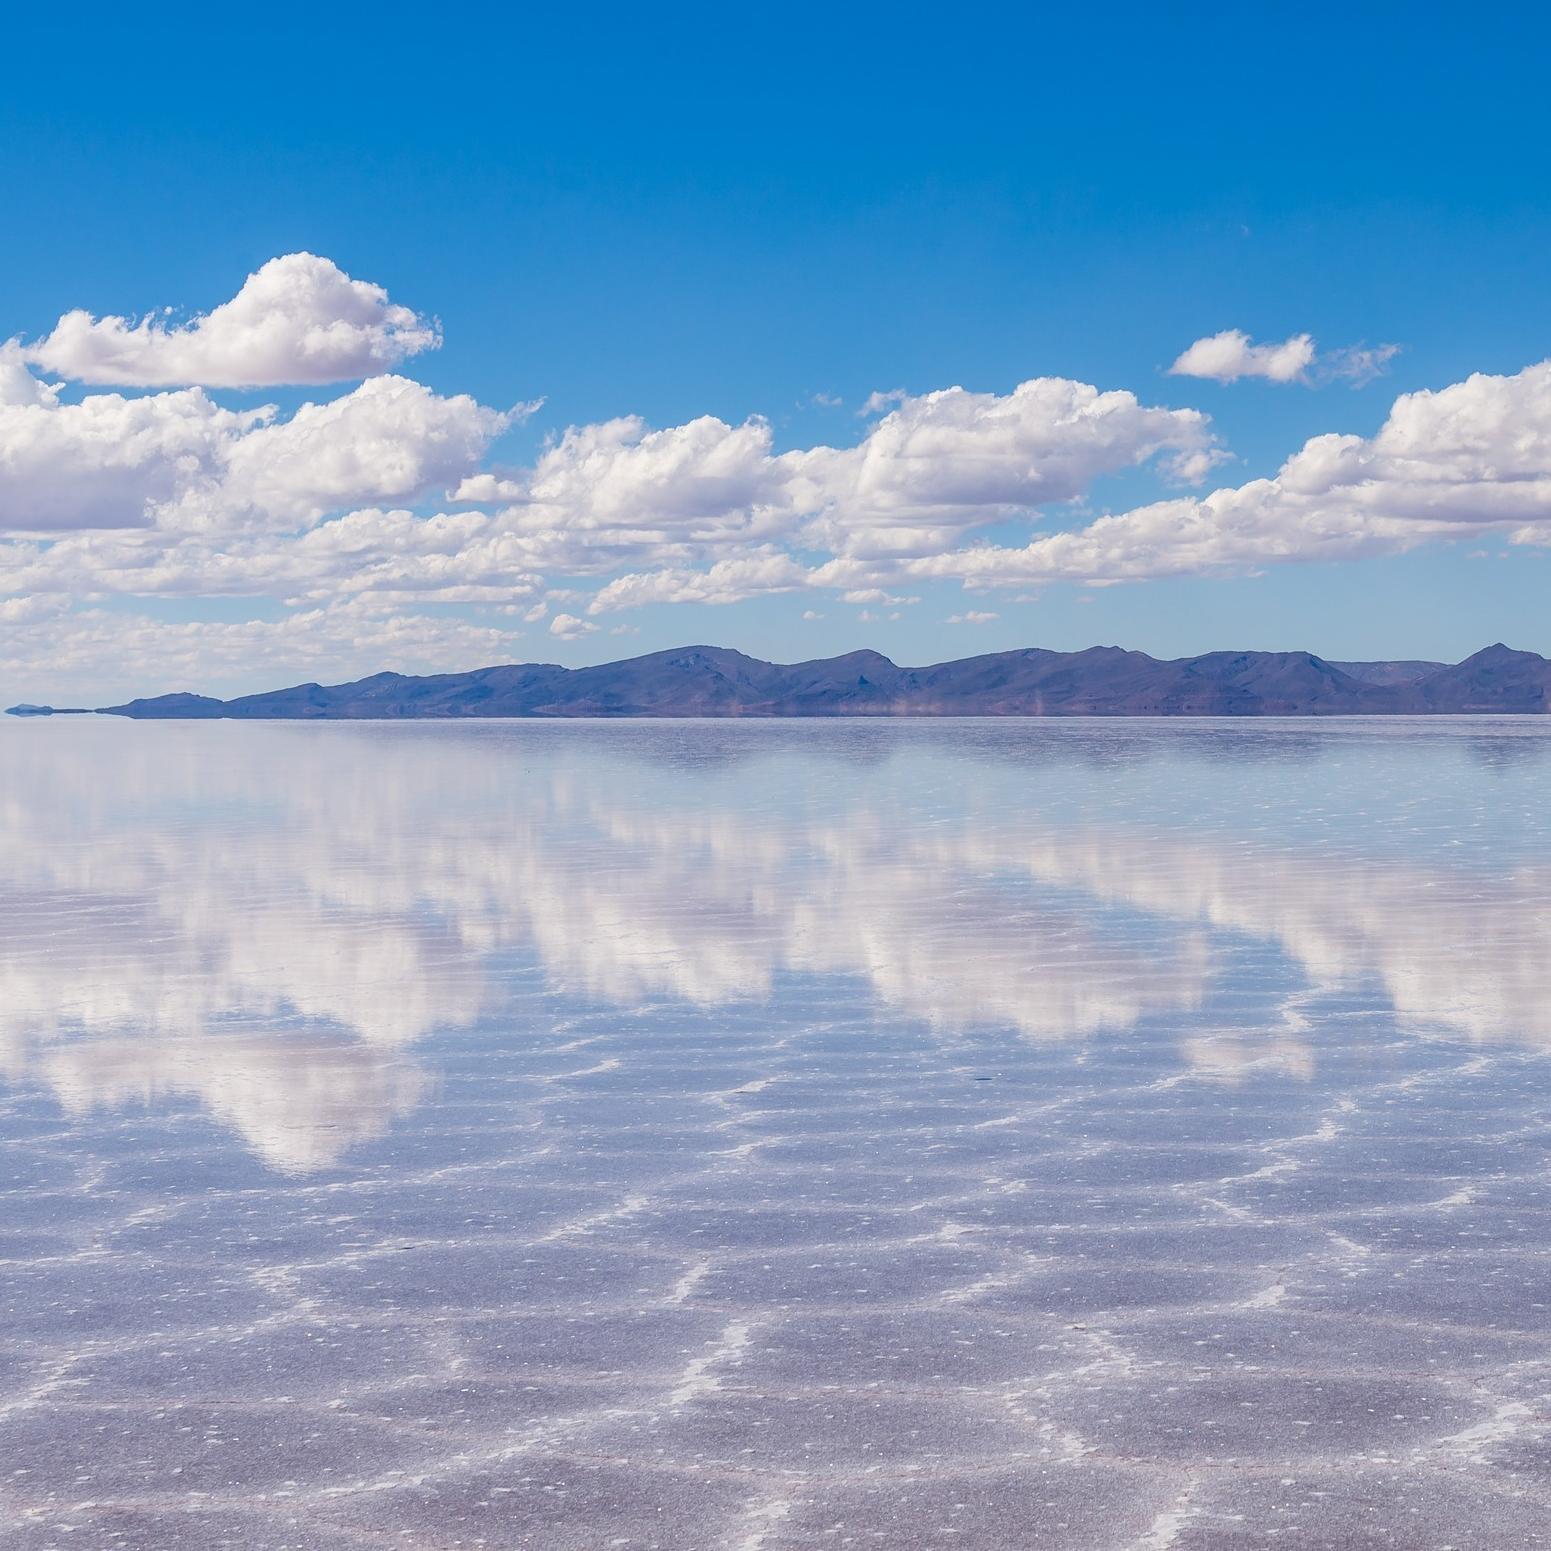 The dreamy Uyuni Salt Flats in Bolivia.